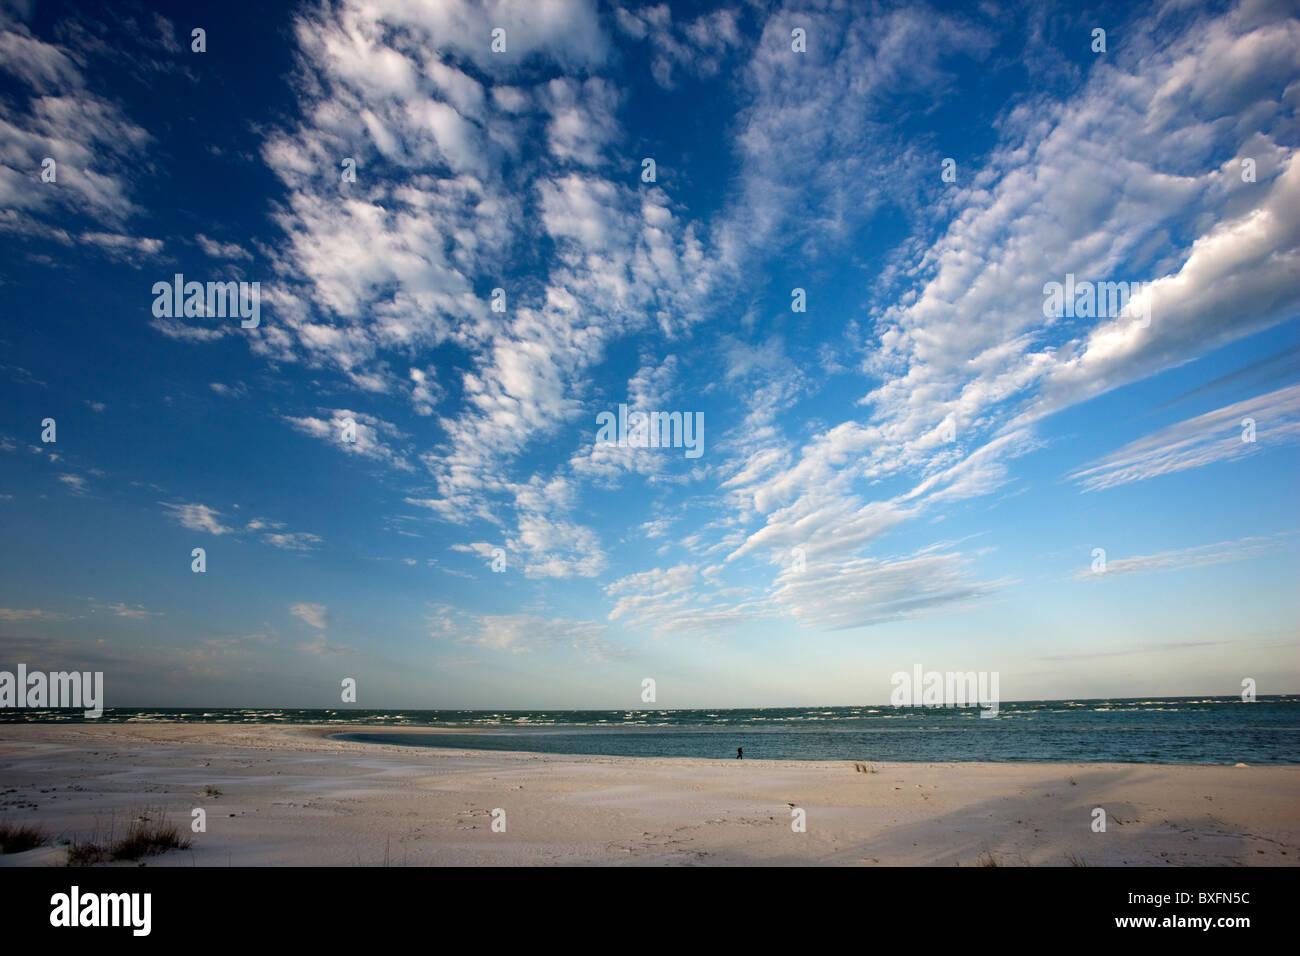 Idyllic shoreline and sandy beach at Anna Maria Island, Florida, United States of America - Stock Image